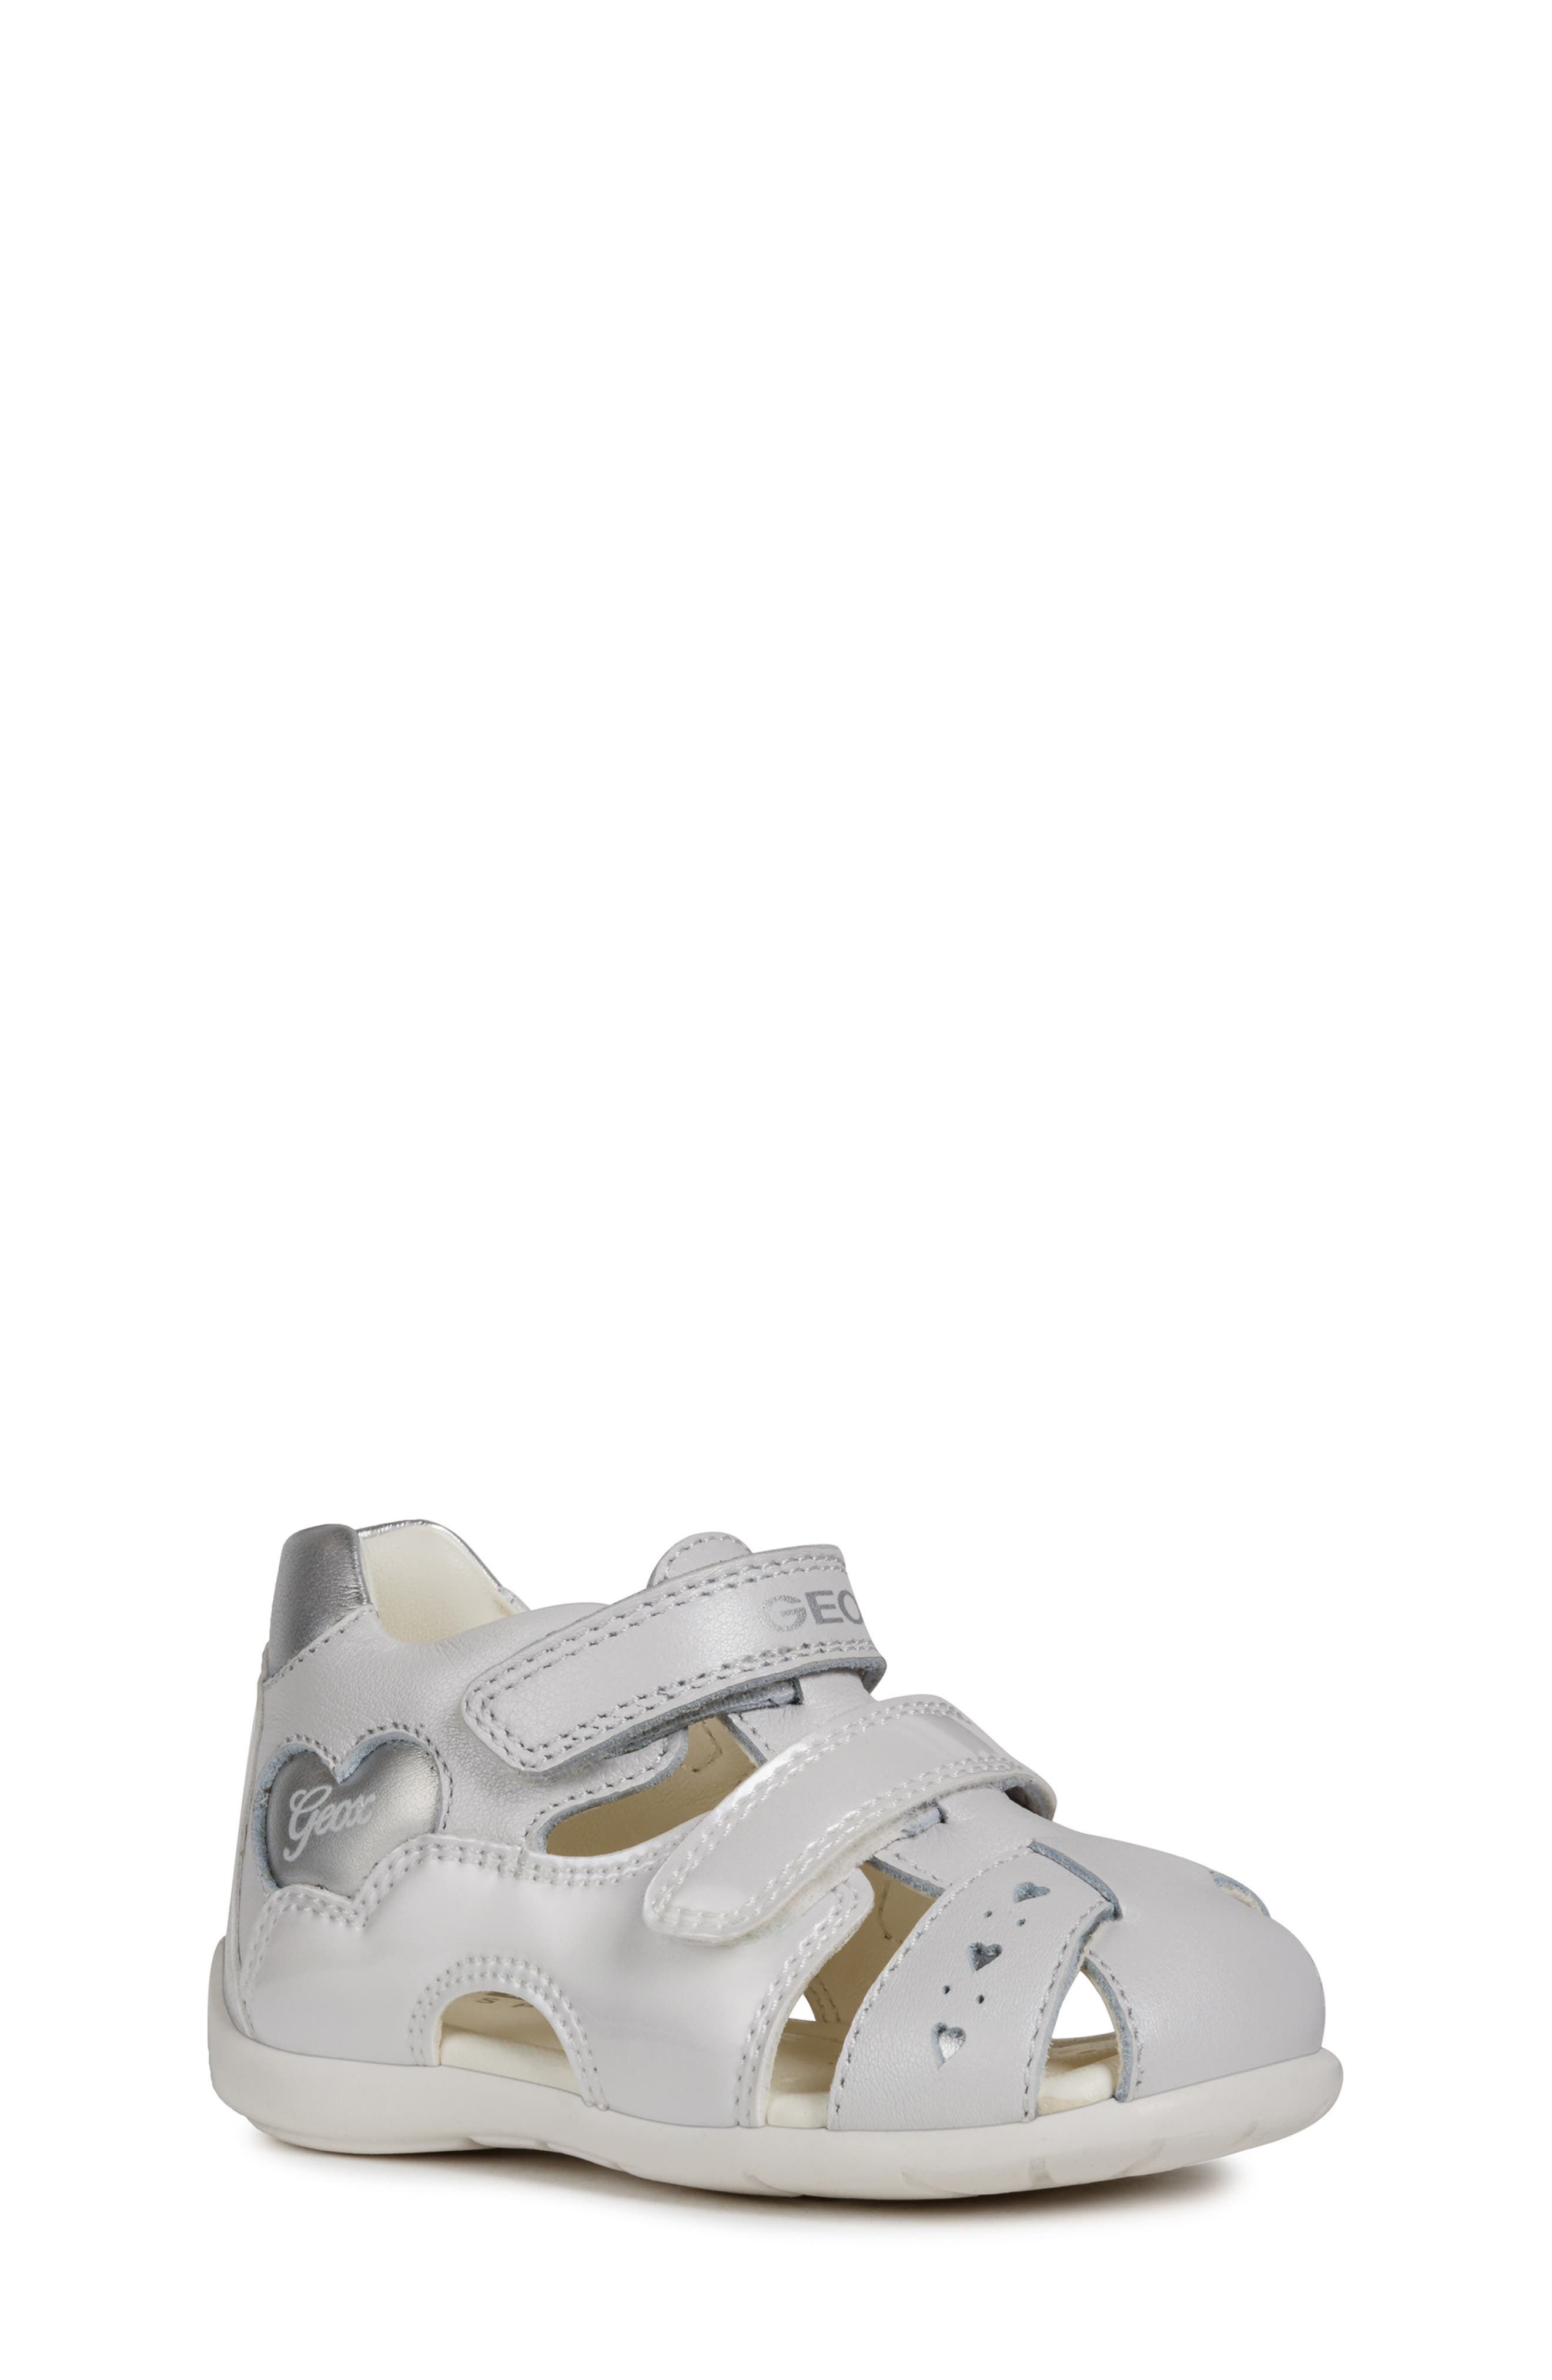 GEOX,                             Kaytan 52 Shimmery Sandal,                             Main thumbnail 1, color,                             WHITE/ SILVER